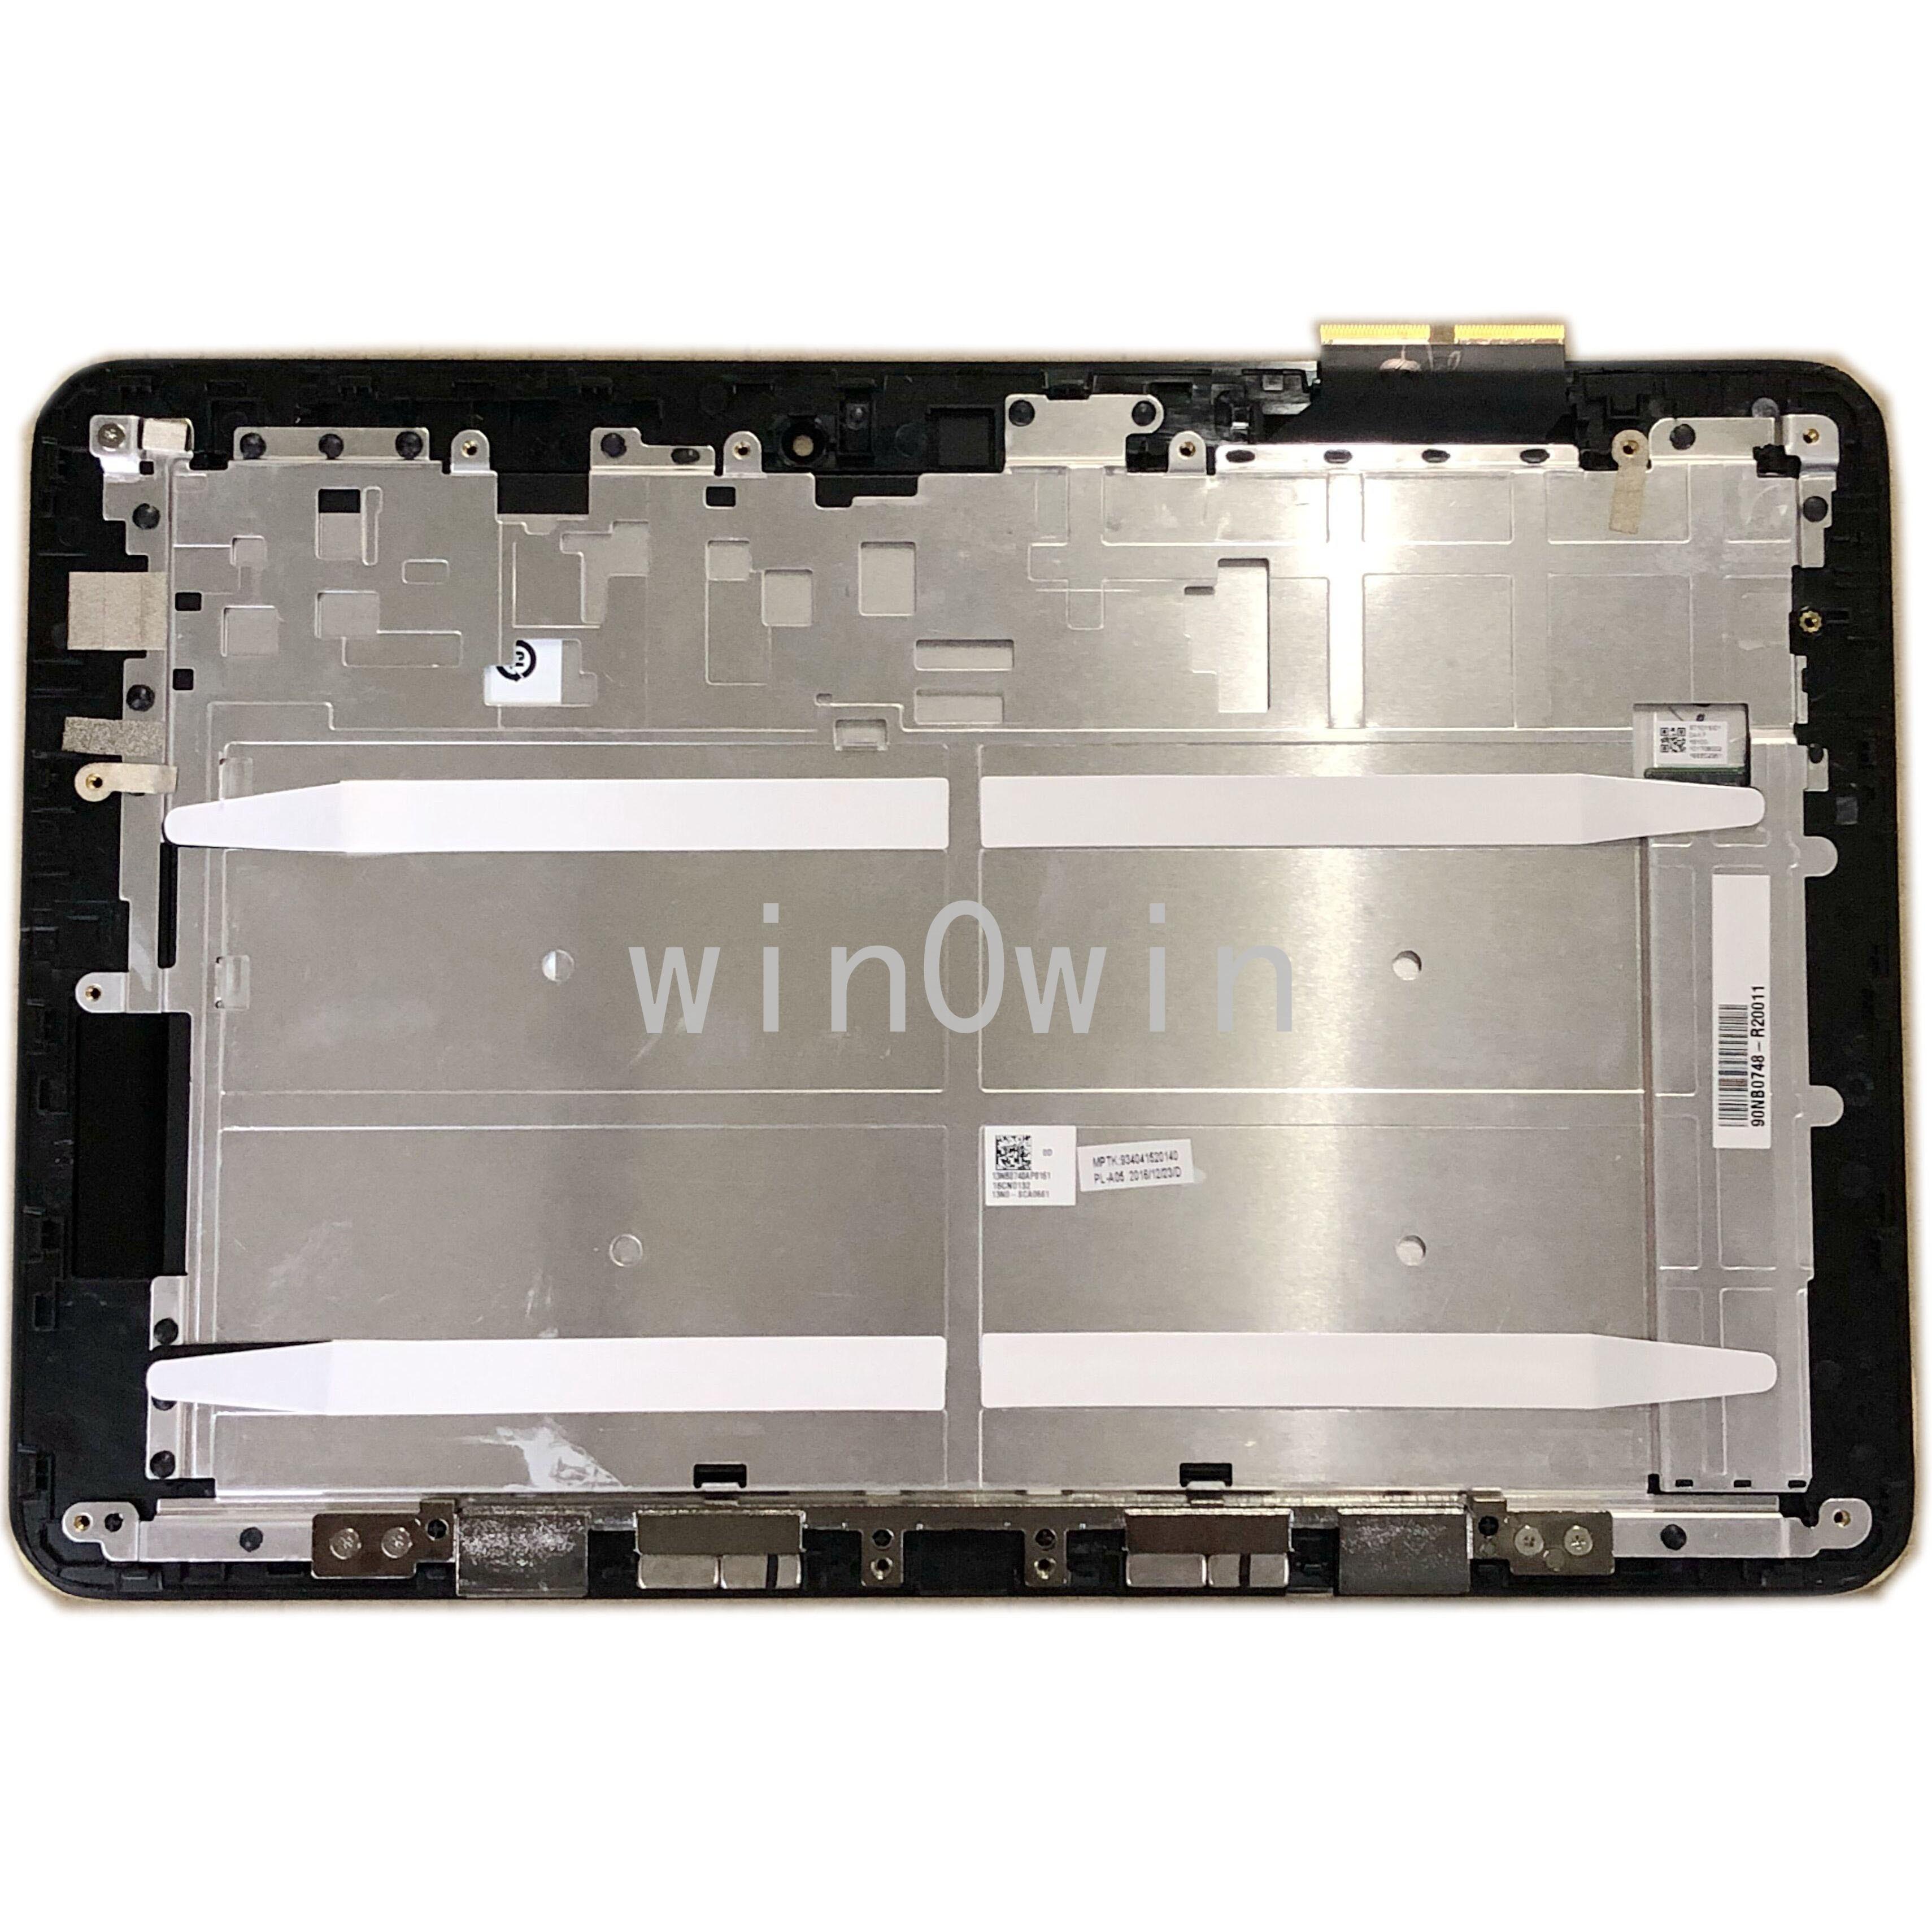 LCD LED شاشة تعمل باللمس الجمعية محول الأرقام مع إطار أسود ل ASUS محول كتاب T100H T100HA FP-ST101SI010AKF-01X